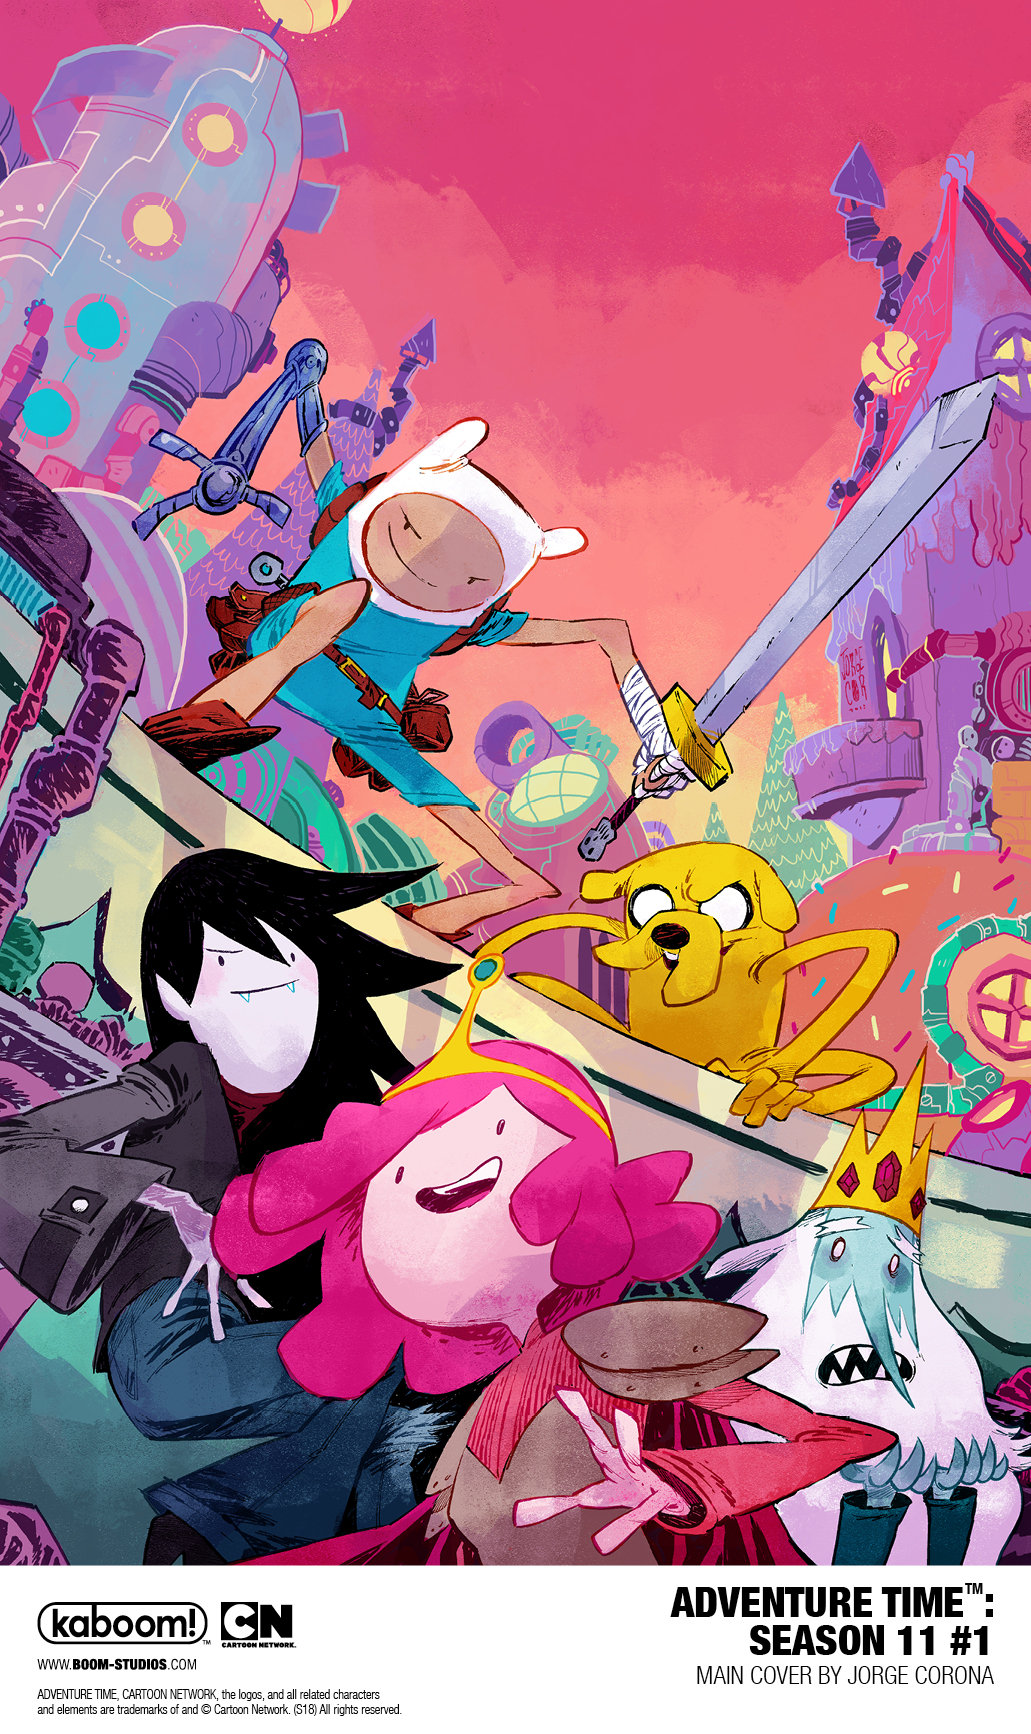 Adventure Time-Season 11 #1 (2018)